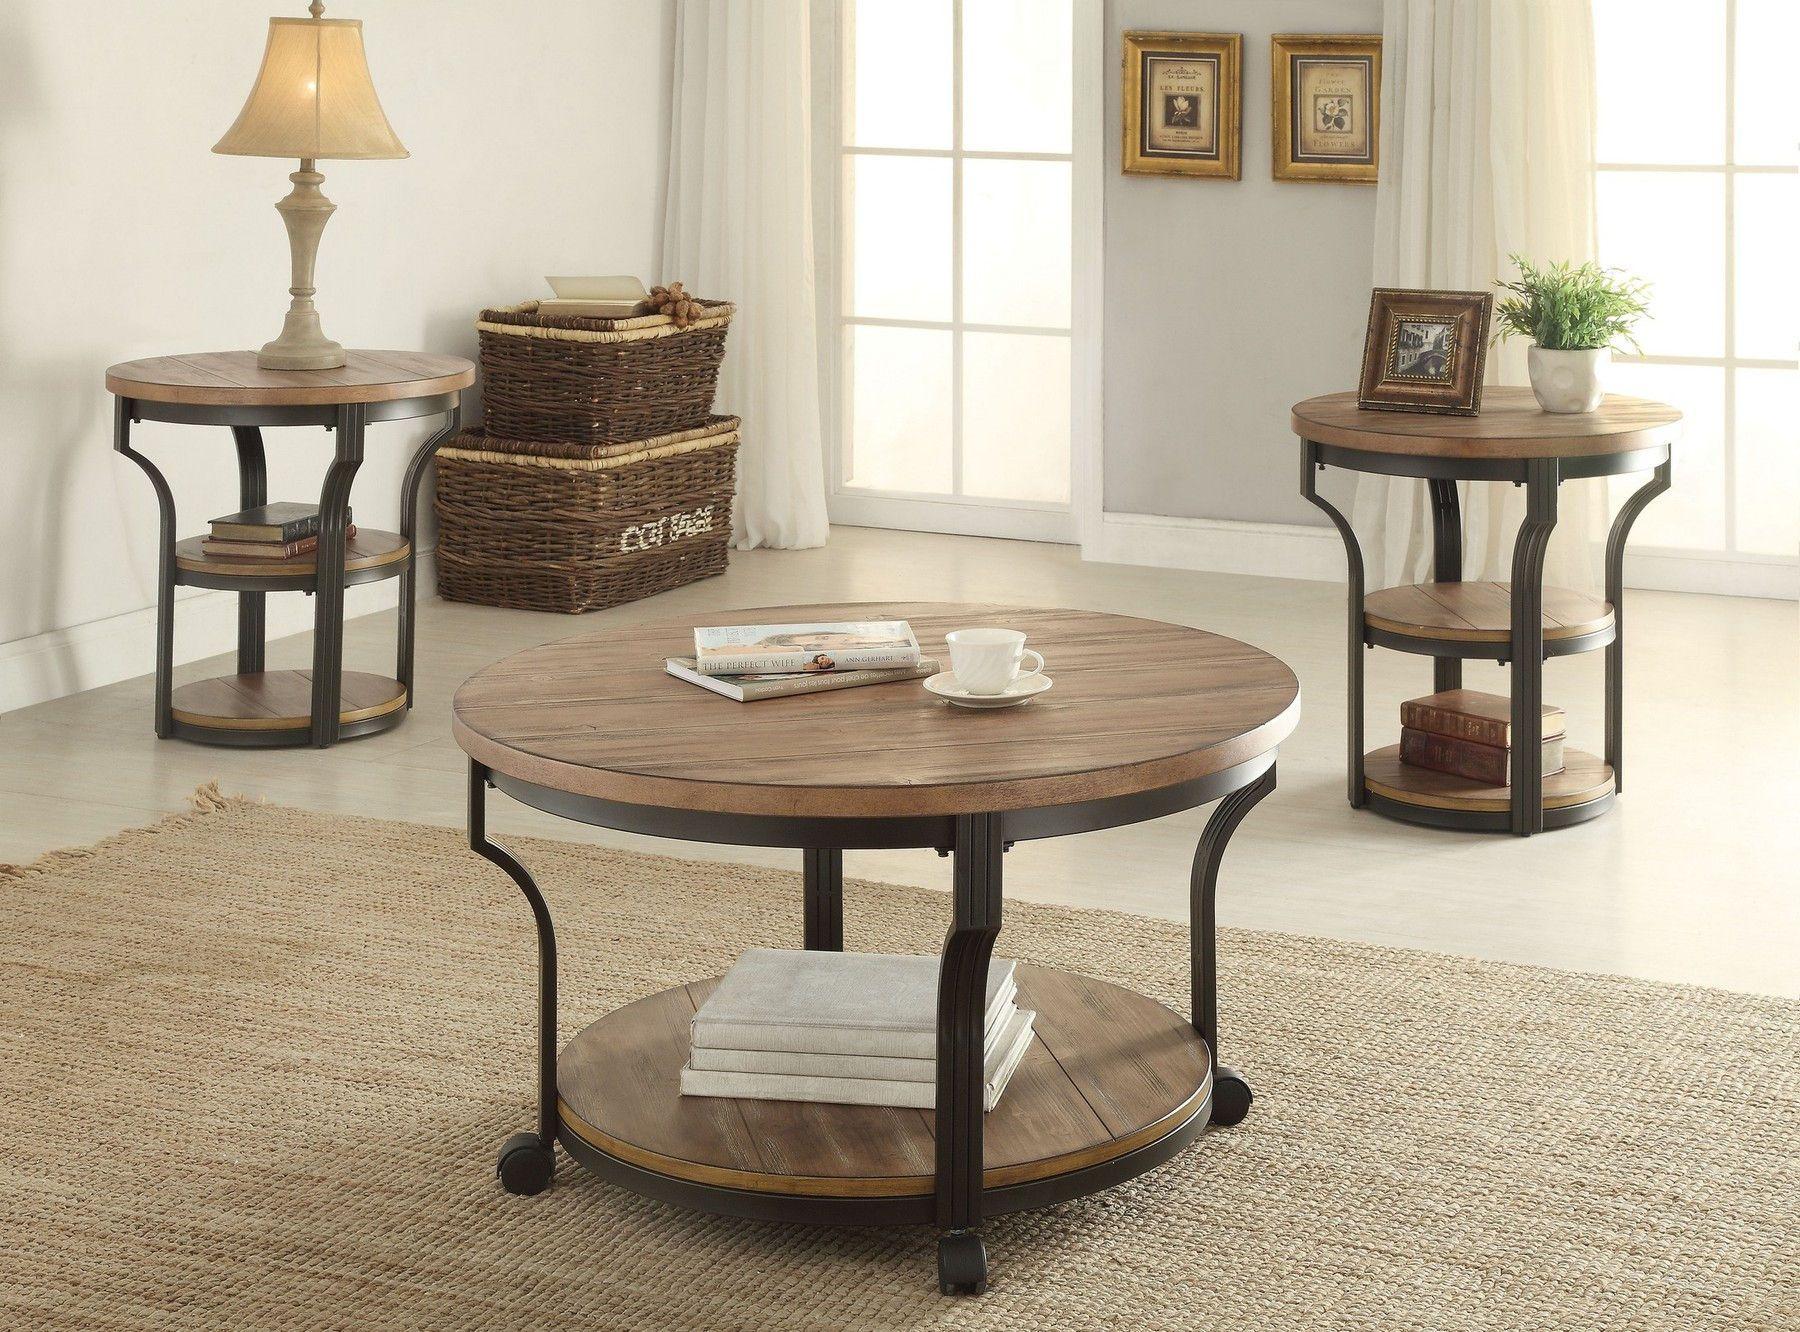 Geoff Coffee Table 80460 Acme Corporation Coffee Tables In 2020 Coffee Table Coffee Table Wood Coffee Table Setting [ 1332 x 1800 Pixel ]